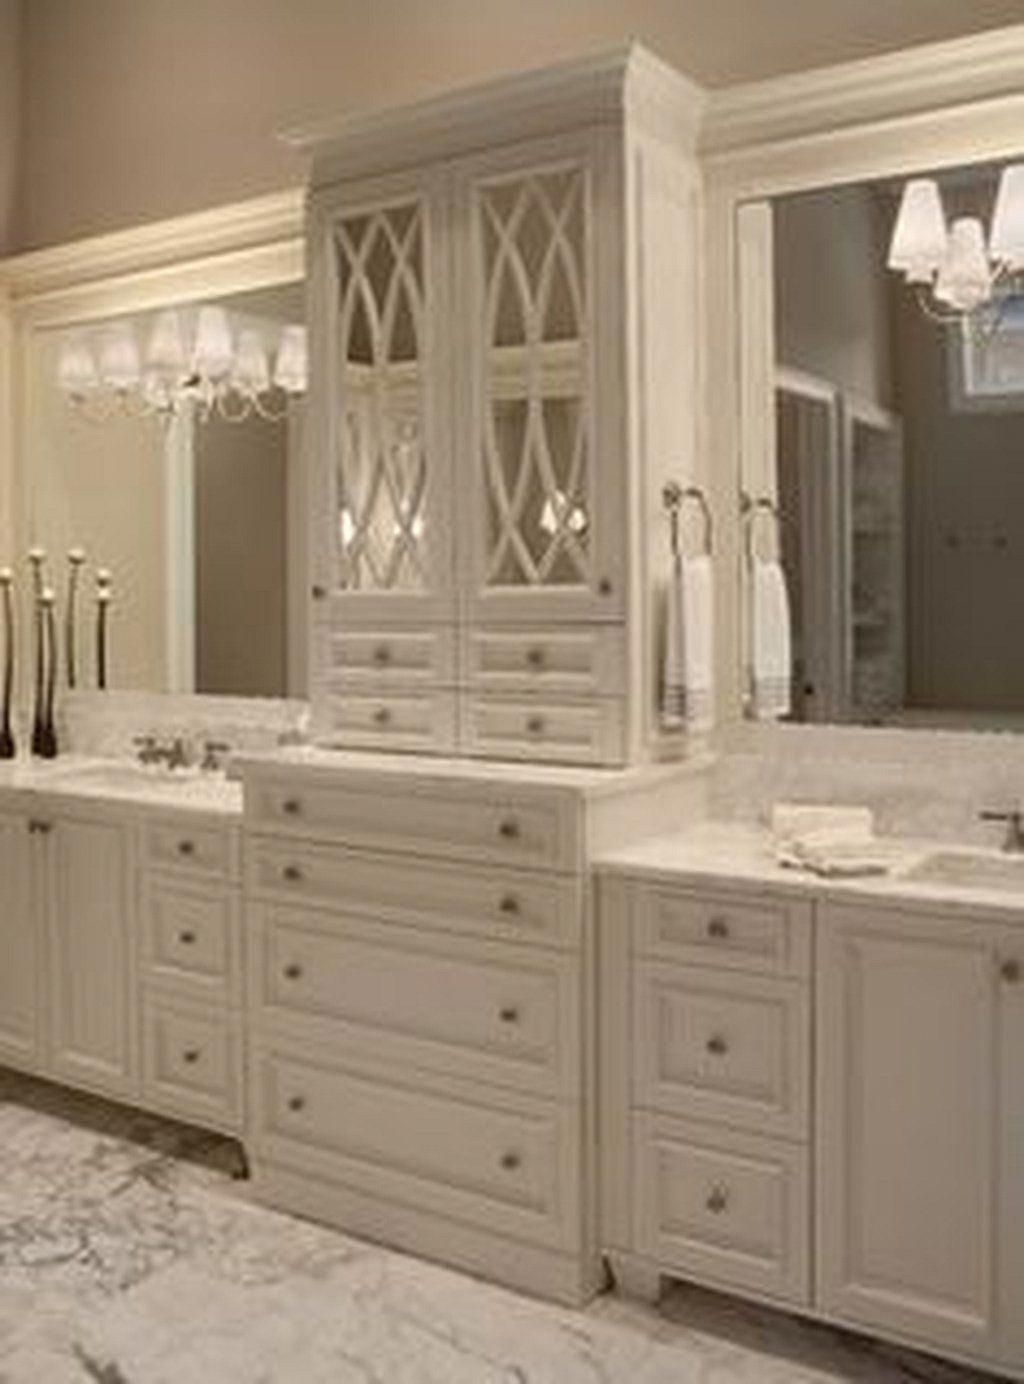 His And Hers Bathroom Set Grey Bathroom Set Black White Bathroom Set 20190606 Dream Bathroom Master Baths Bathroom Remodel Master Bathrooms Remodel